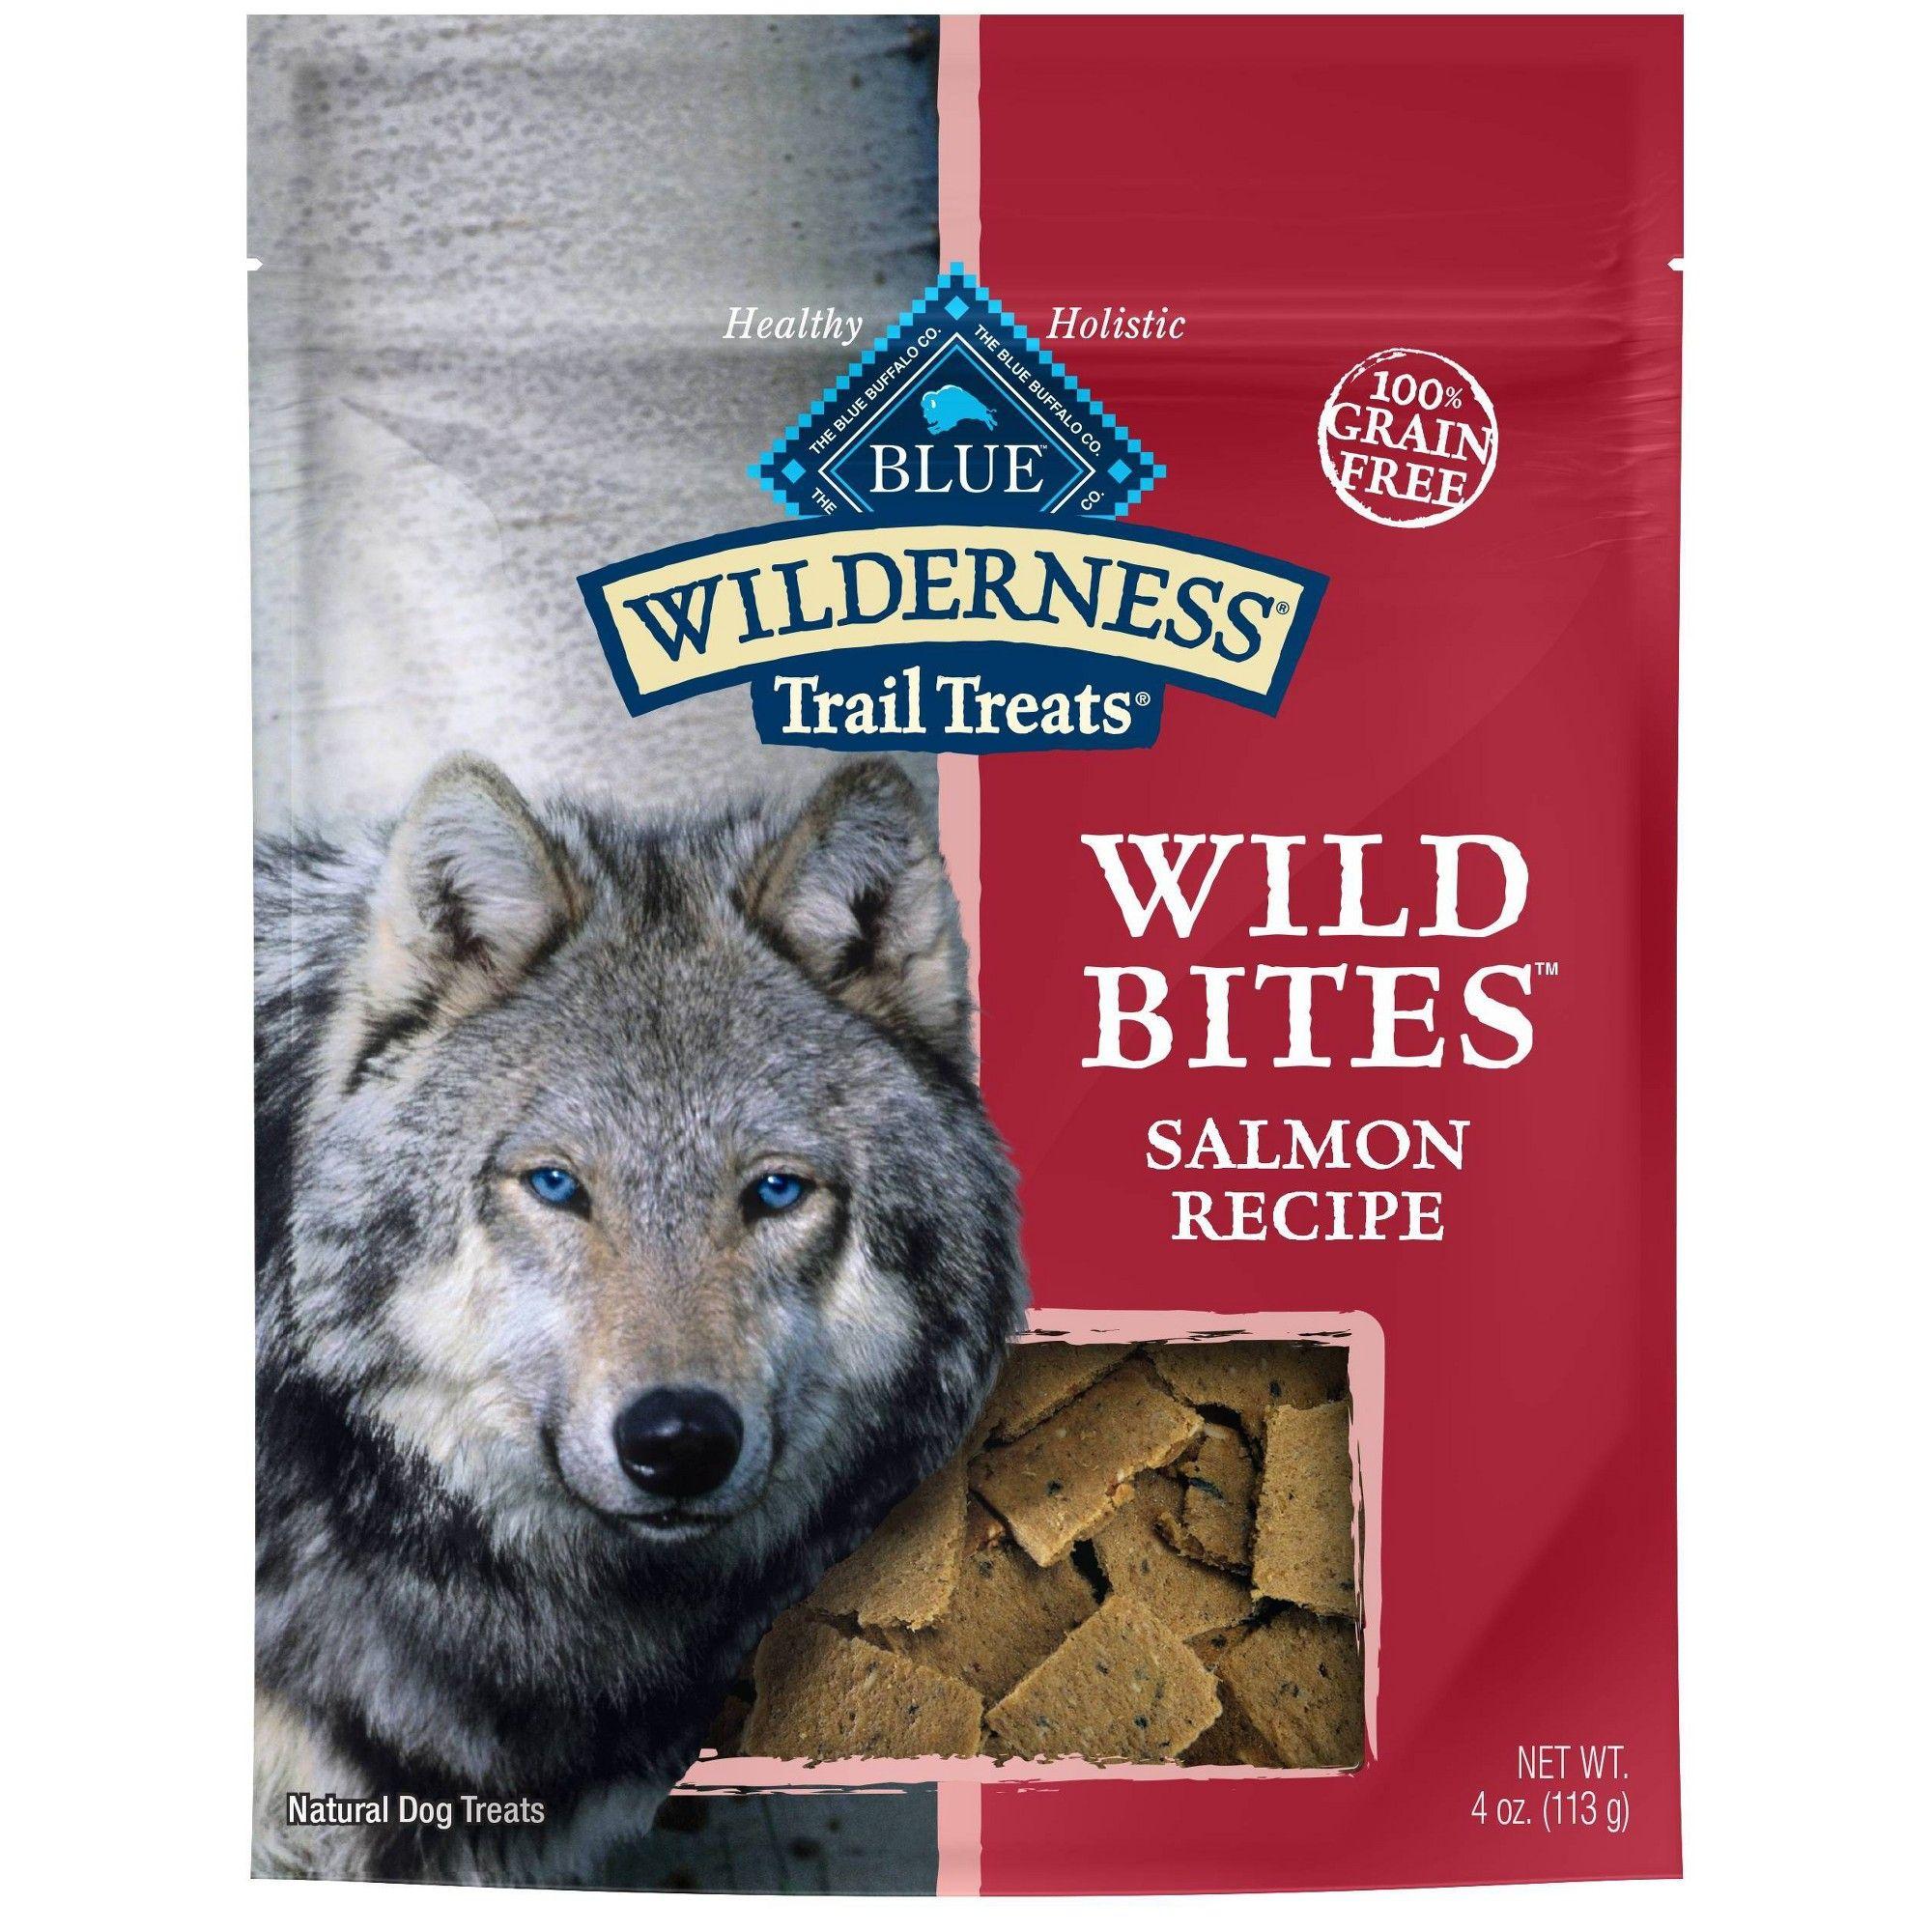 Blue Buffalo Wilderness 100 Grain Free Wild Bites Salmon Recipe